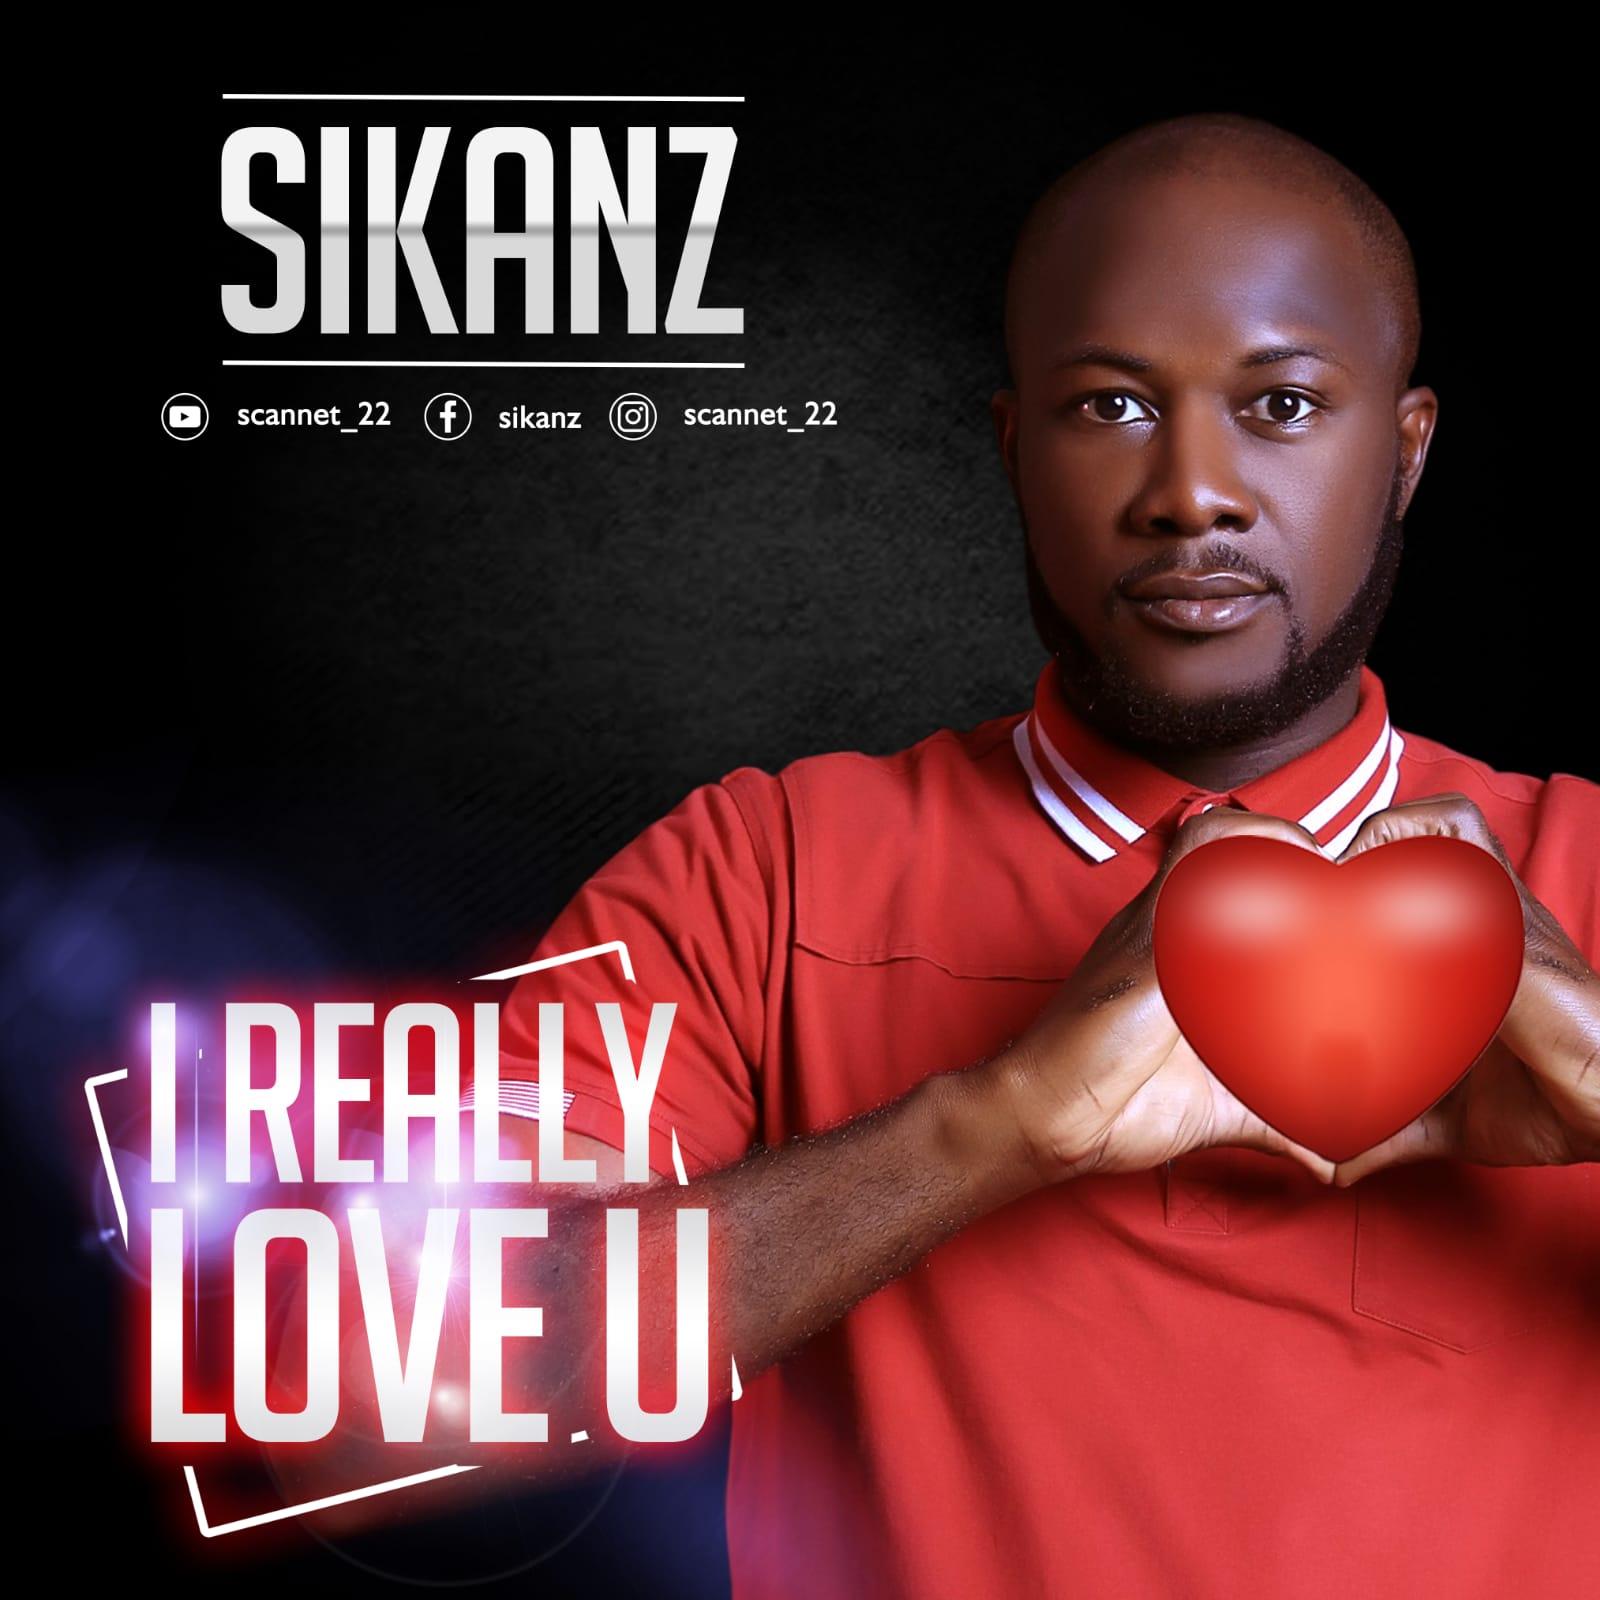 Sikanz - I Really Love U (Lyrics + Free Mp3 Streaming)